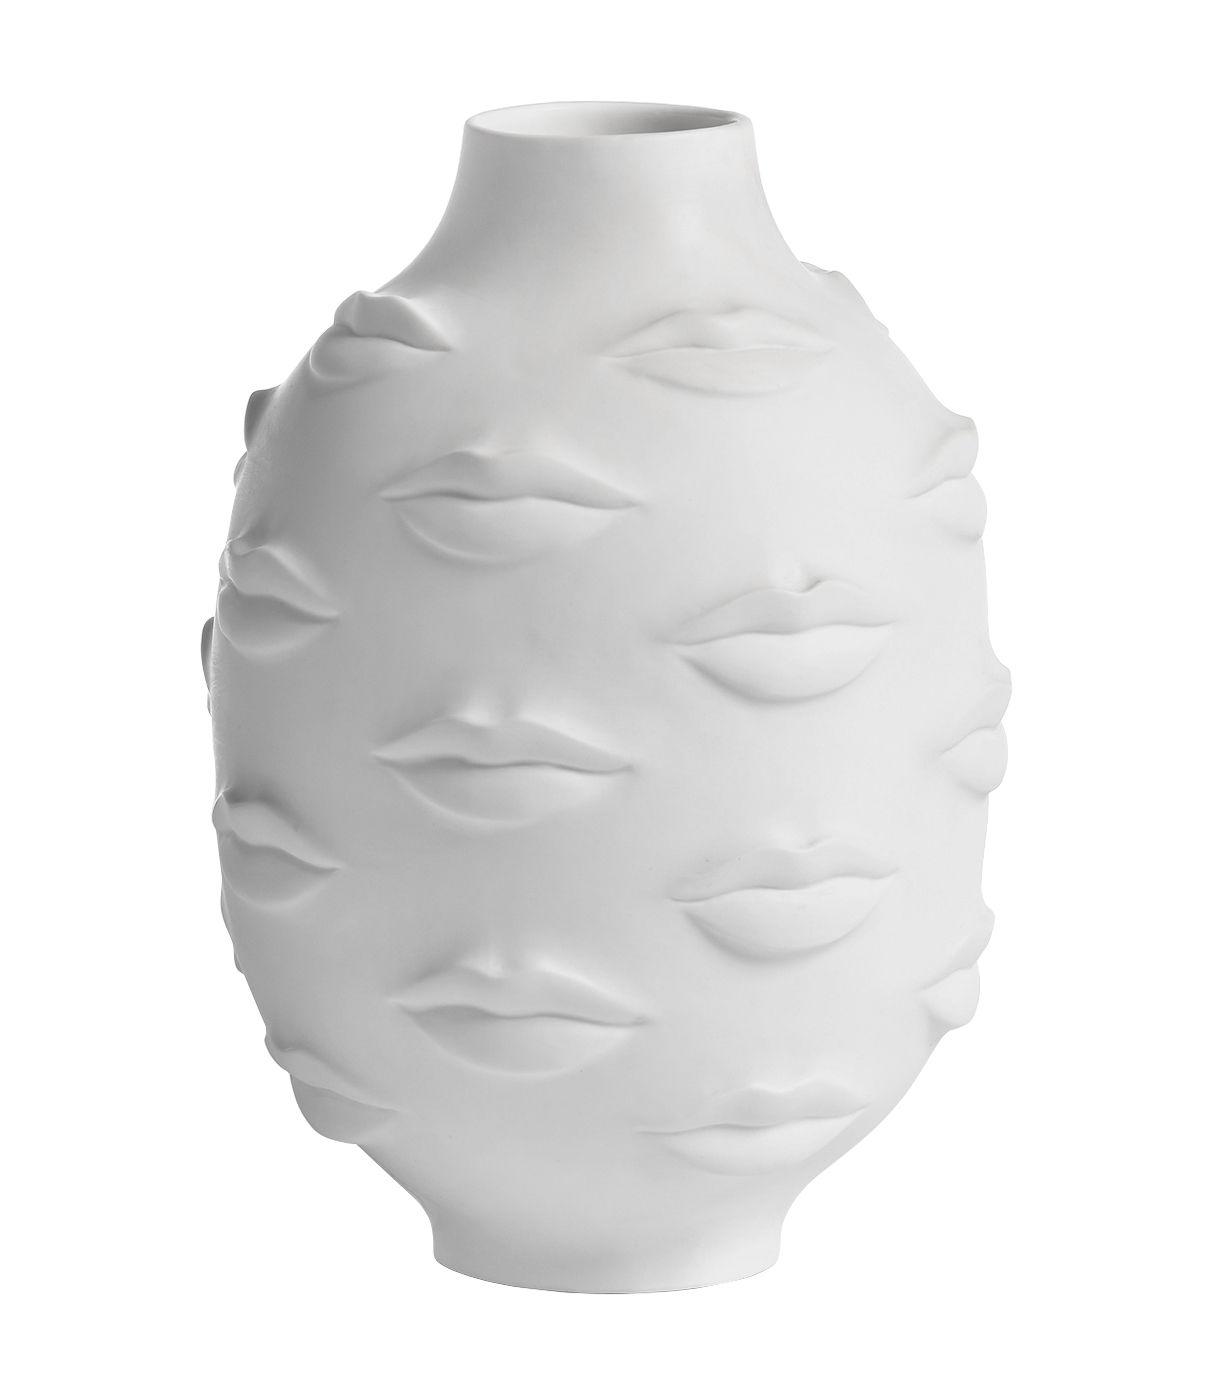 Déco - Vases - Vase Muse Round Gala / Porcelaine - H 25 cm - Jonathan Adler - Blanc mat - Porcelaine blanche mate